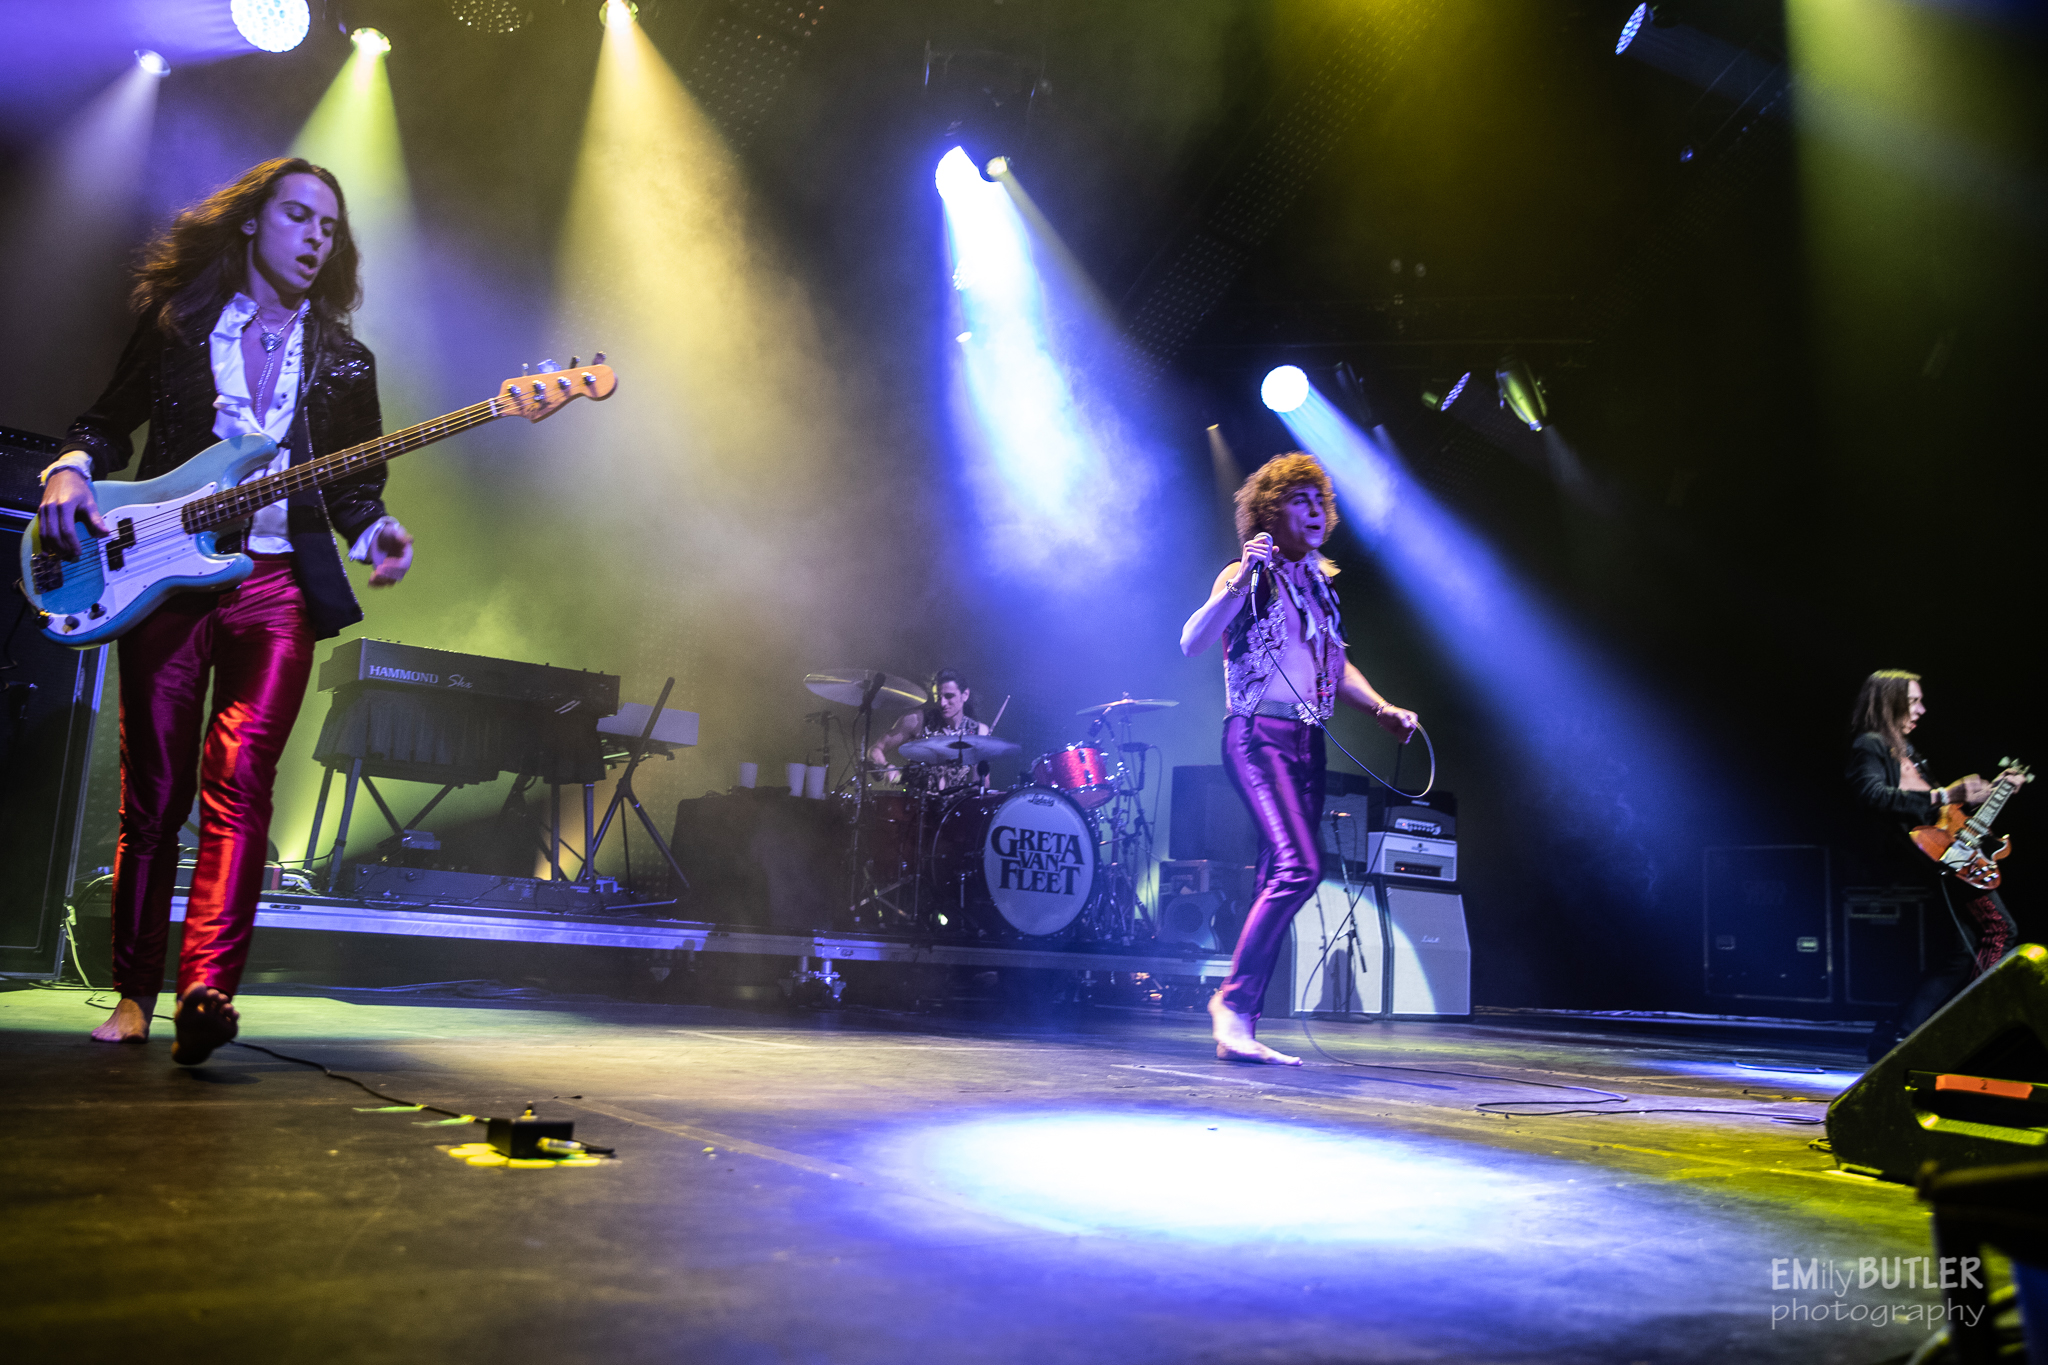 Municipal Credit Union >> PHOTOS: Greta Van Fleet Offers Up Electric Performance At Atlanta's Fox Theatre